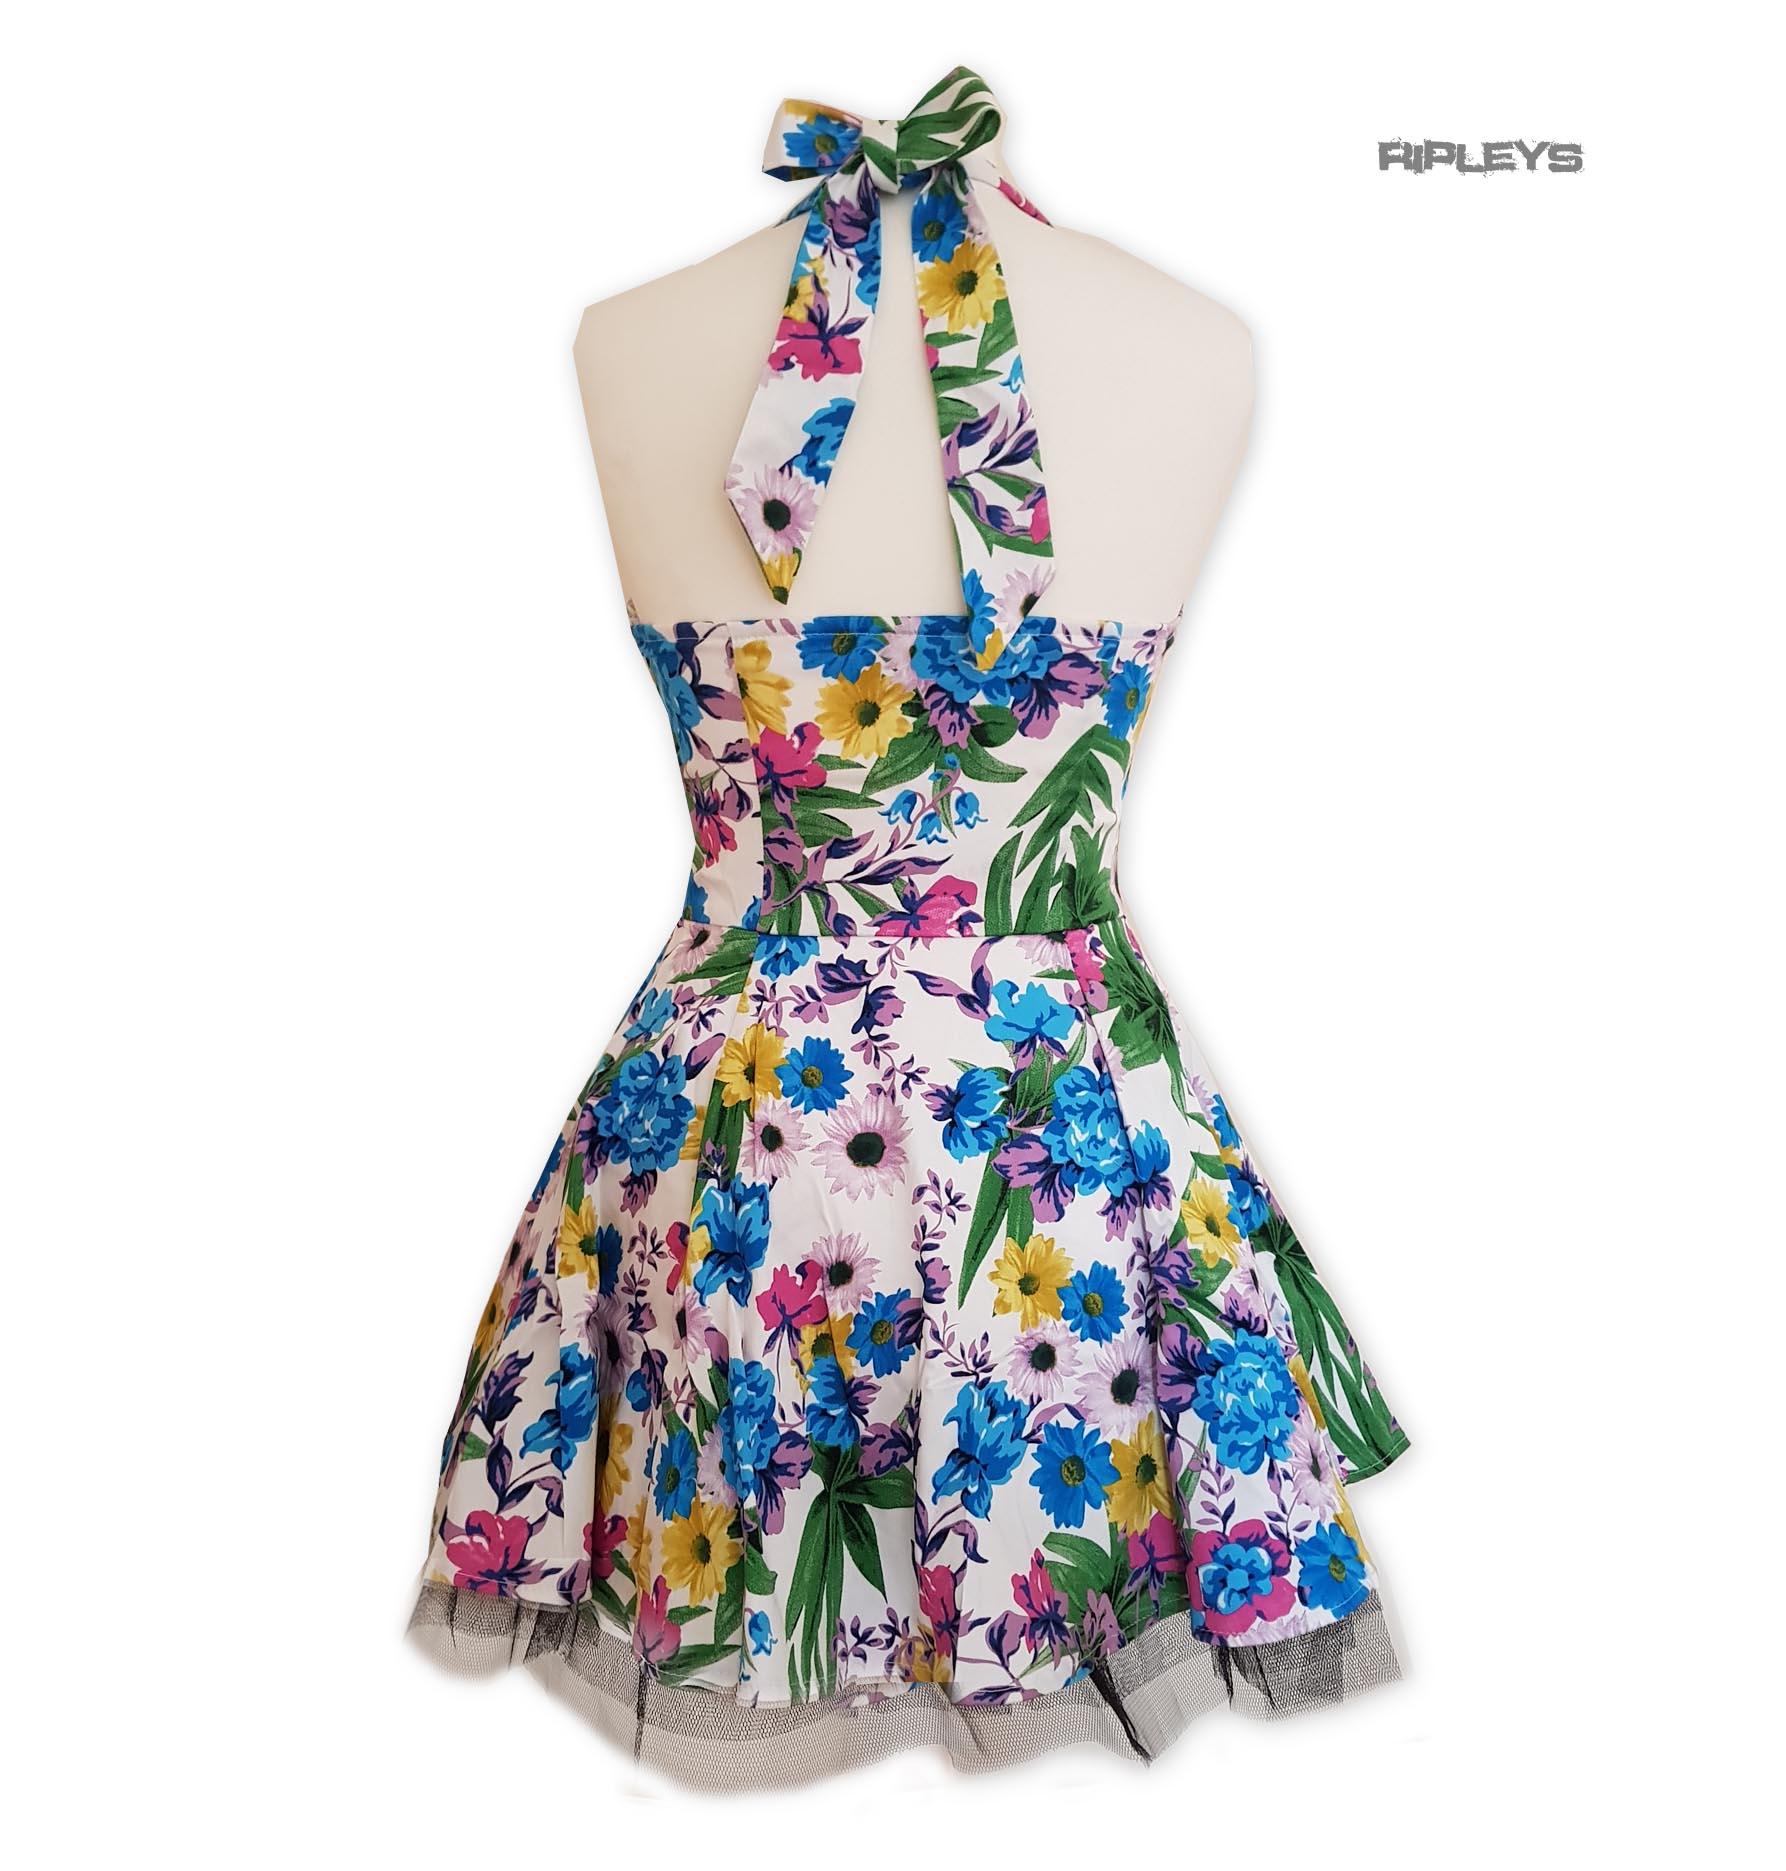 H-amp-R-Hearts-amp-Roses-London-White-Mini-Dress-039-Summer-Day-039-Flowers-All-Sizes thumbnail 8